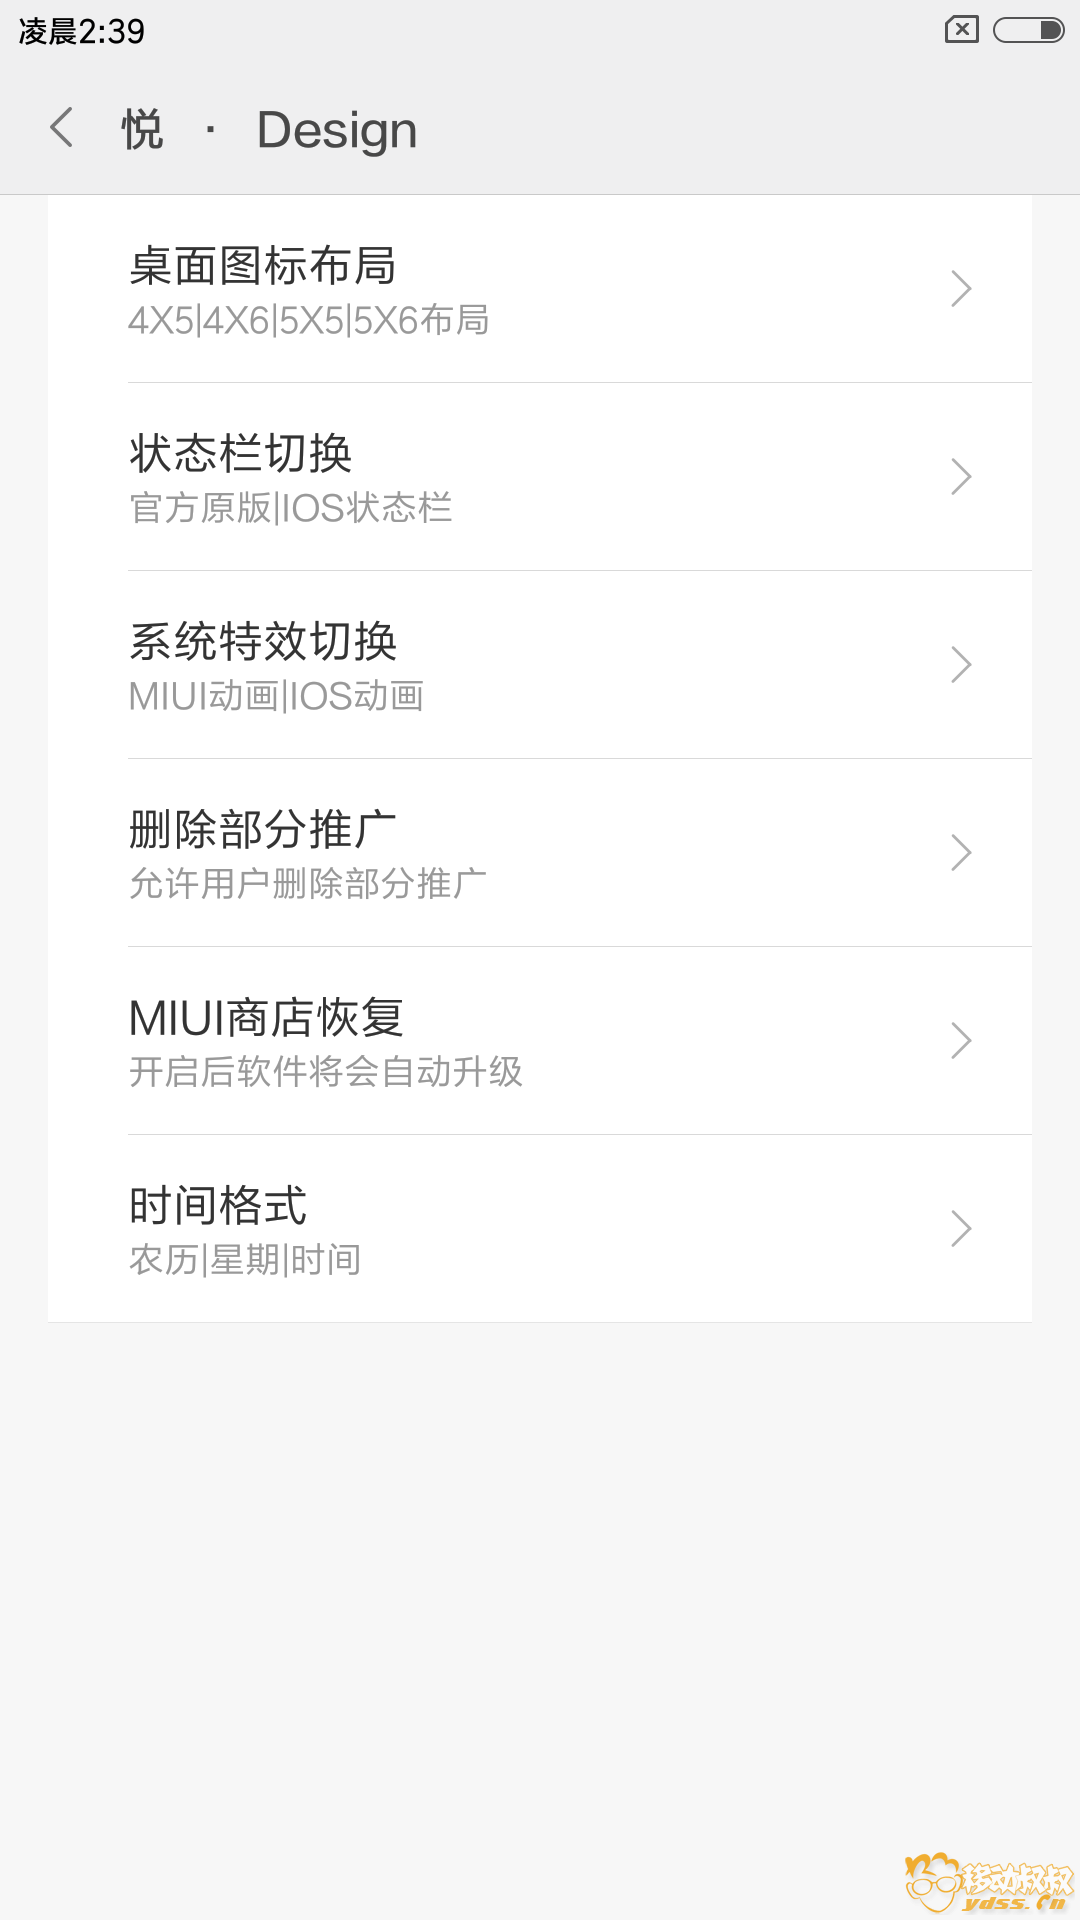 Screenshot_2018-01-04-02-39-31-627_com.mrxy.design.png